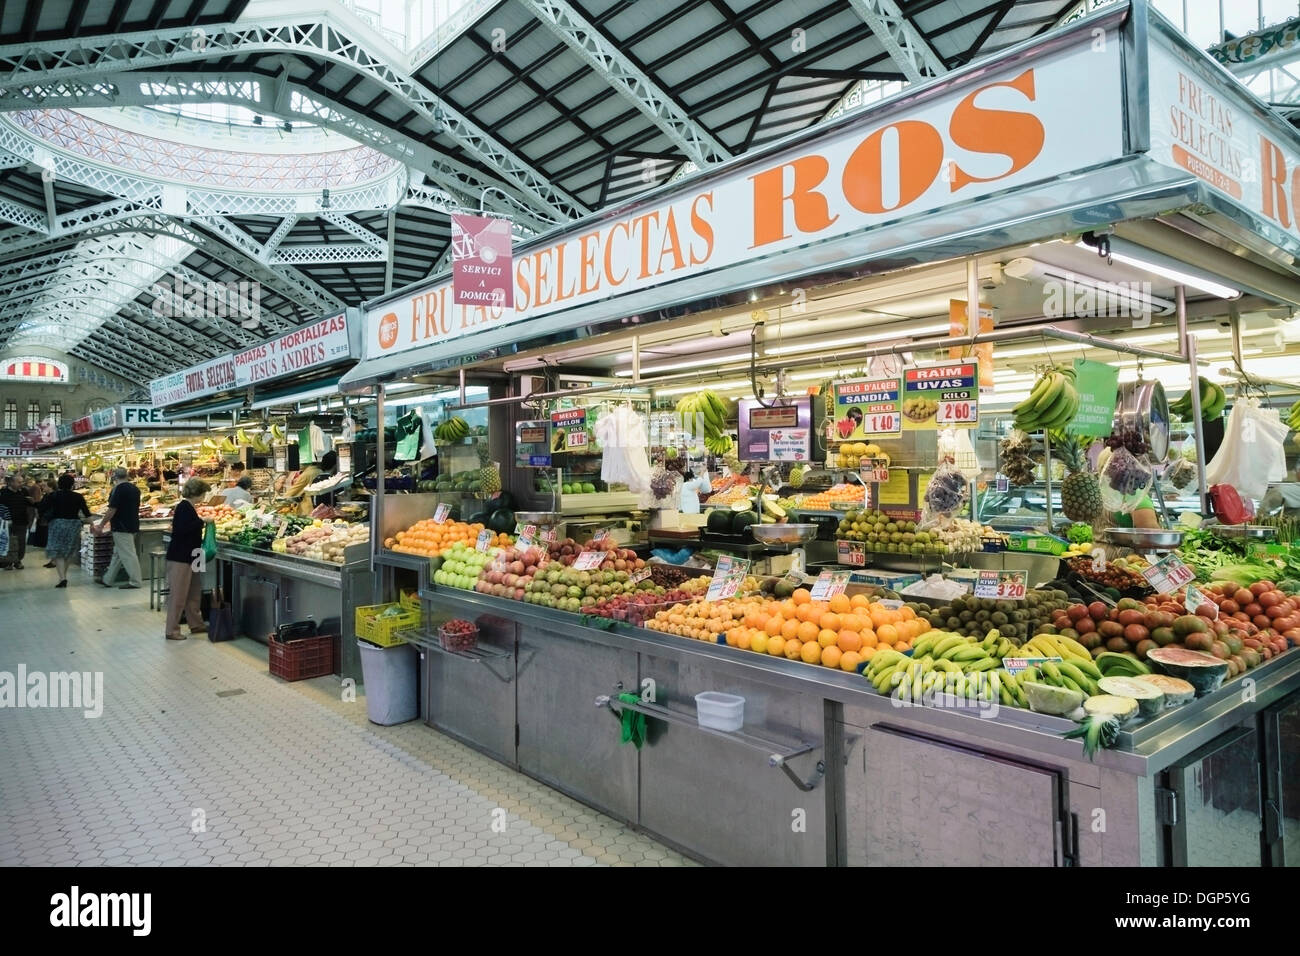 Mercado Central market, Valencia, Comunidad Valencia, Spain, Europe - Stock Image